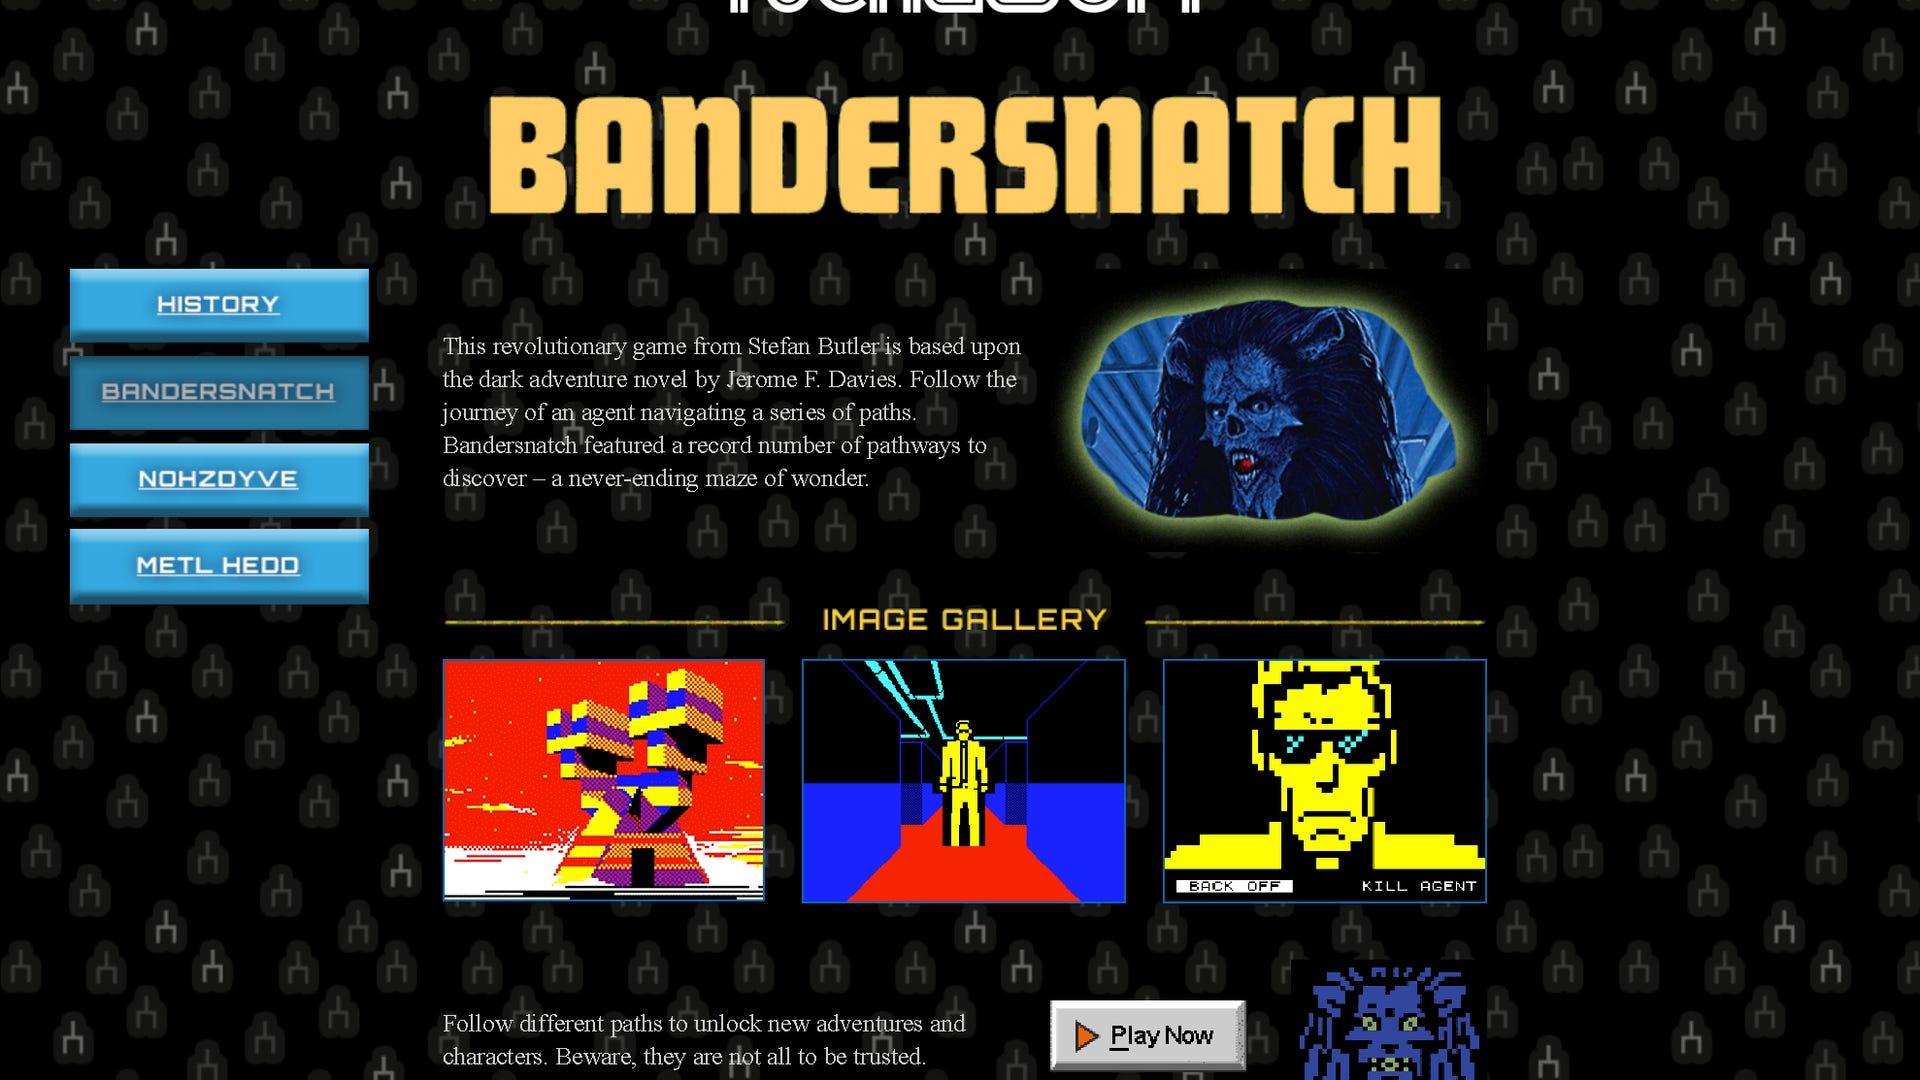 bandersnatch-webpage.png